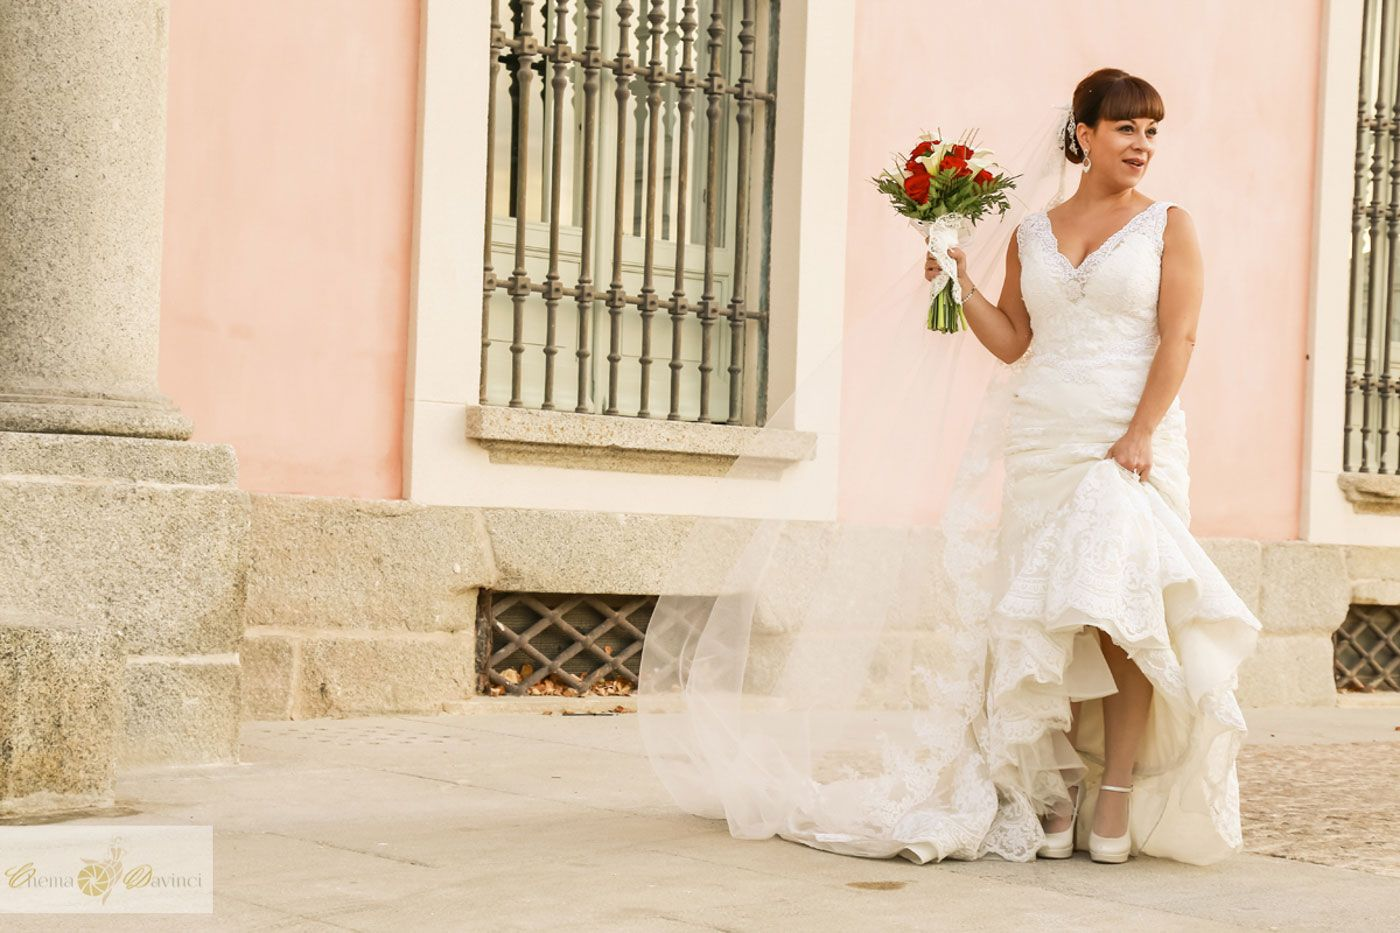 _MG_1644-antecoctail-iglesia-boda-lbertoypili-chemaydavinci-wb